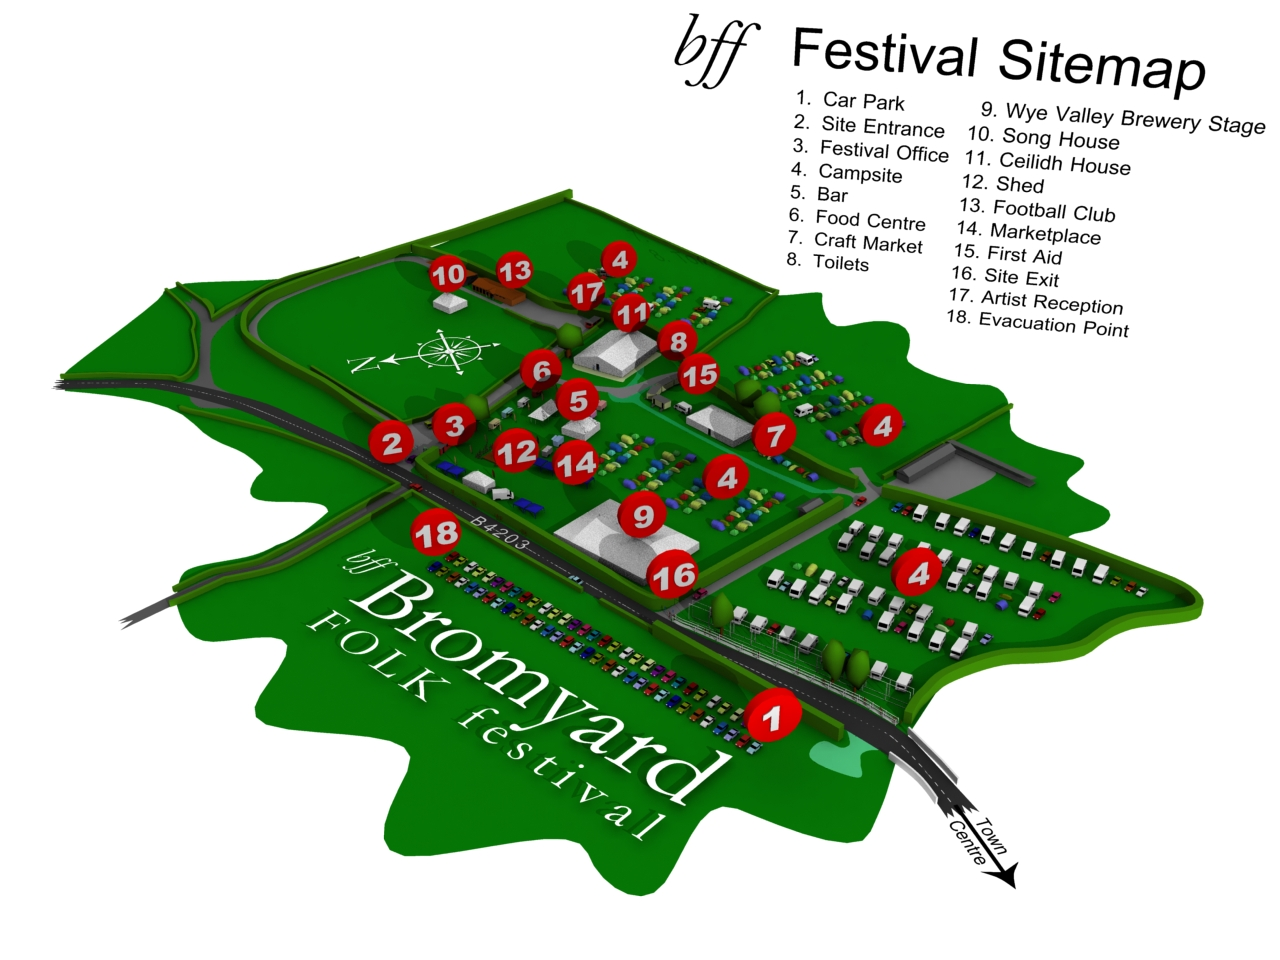 bromyard-folk-festival-sitemap04